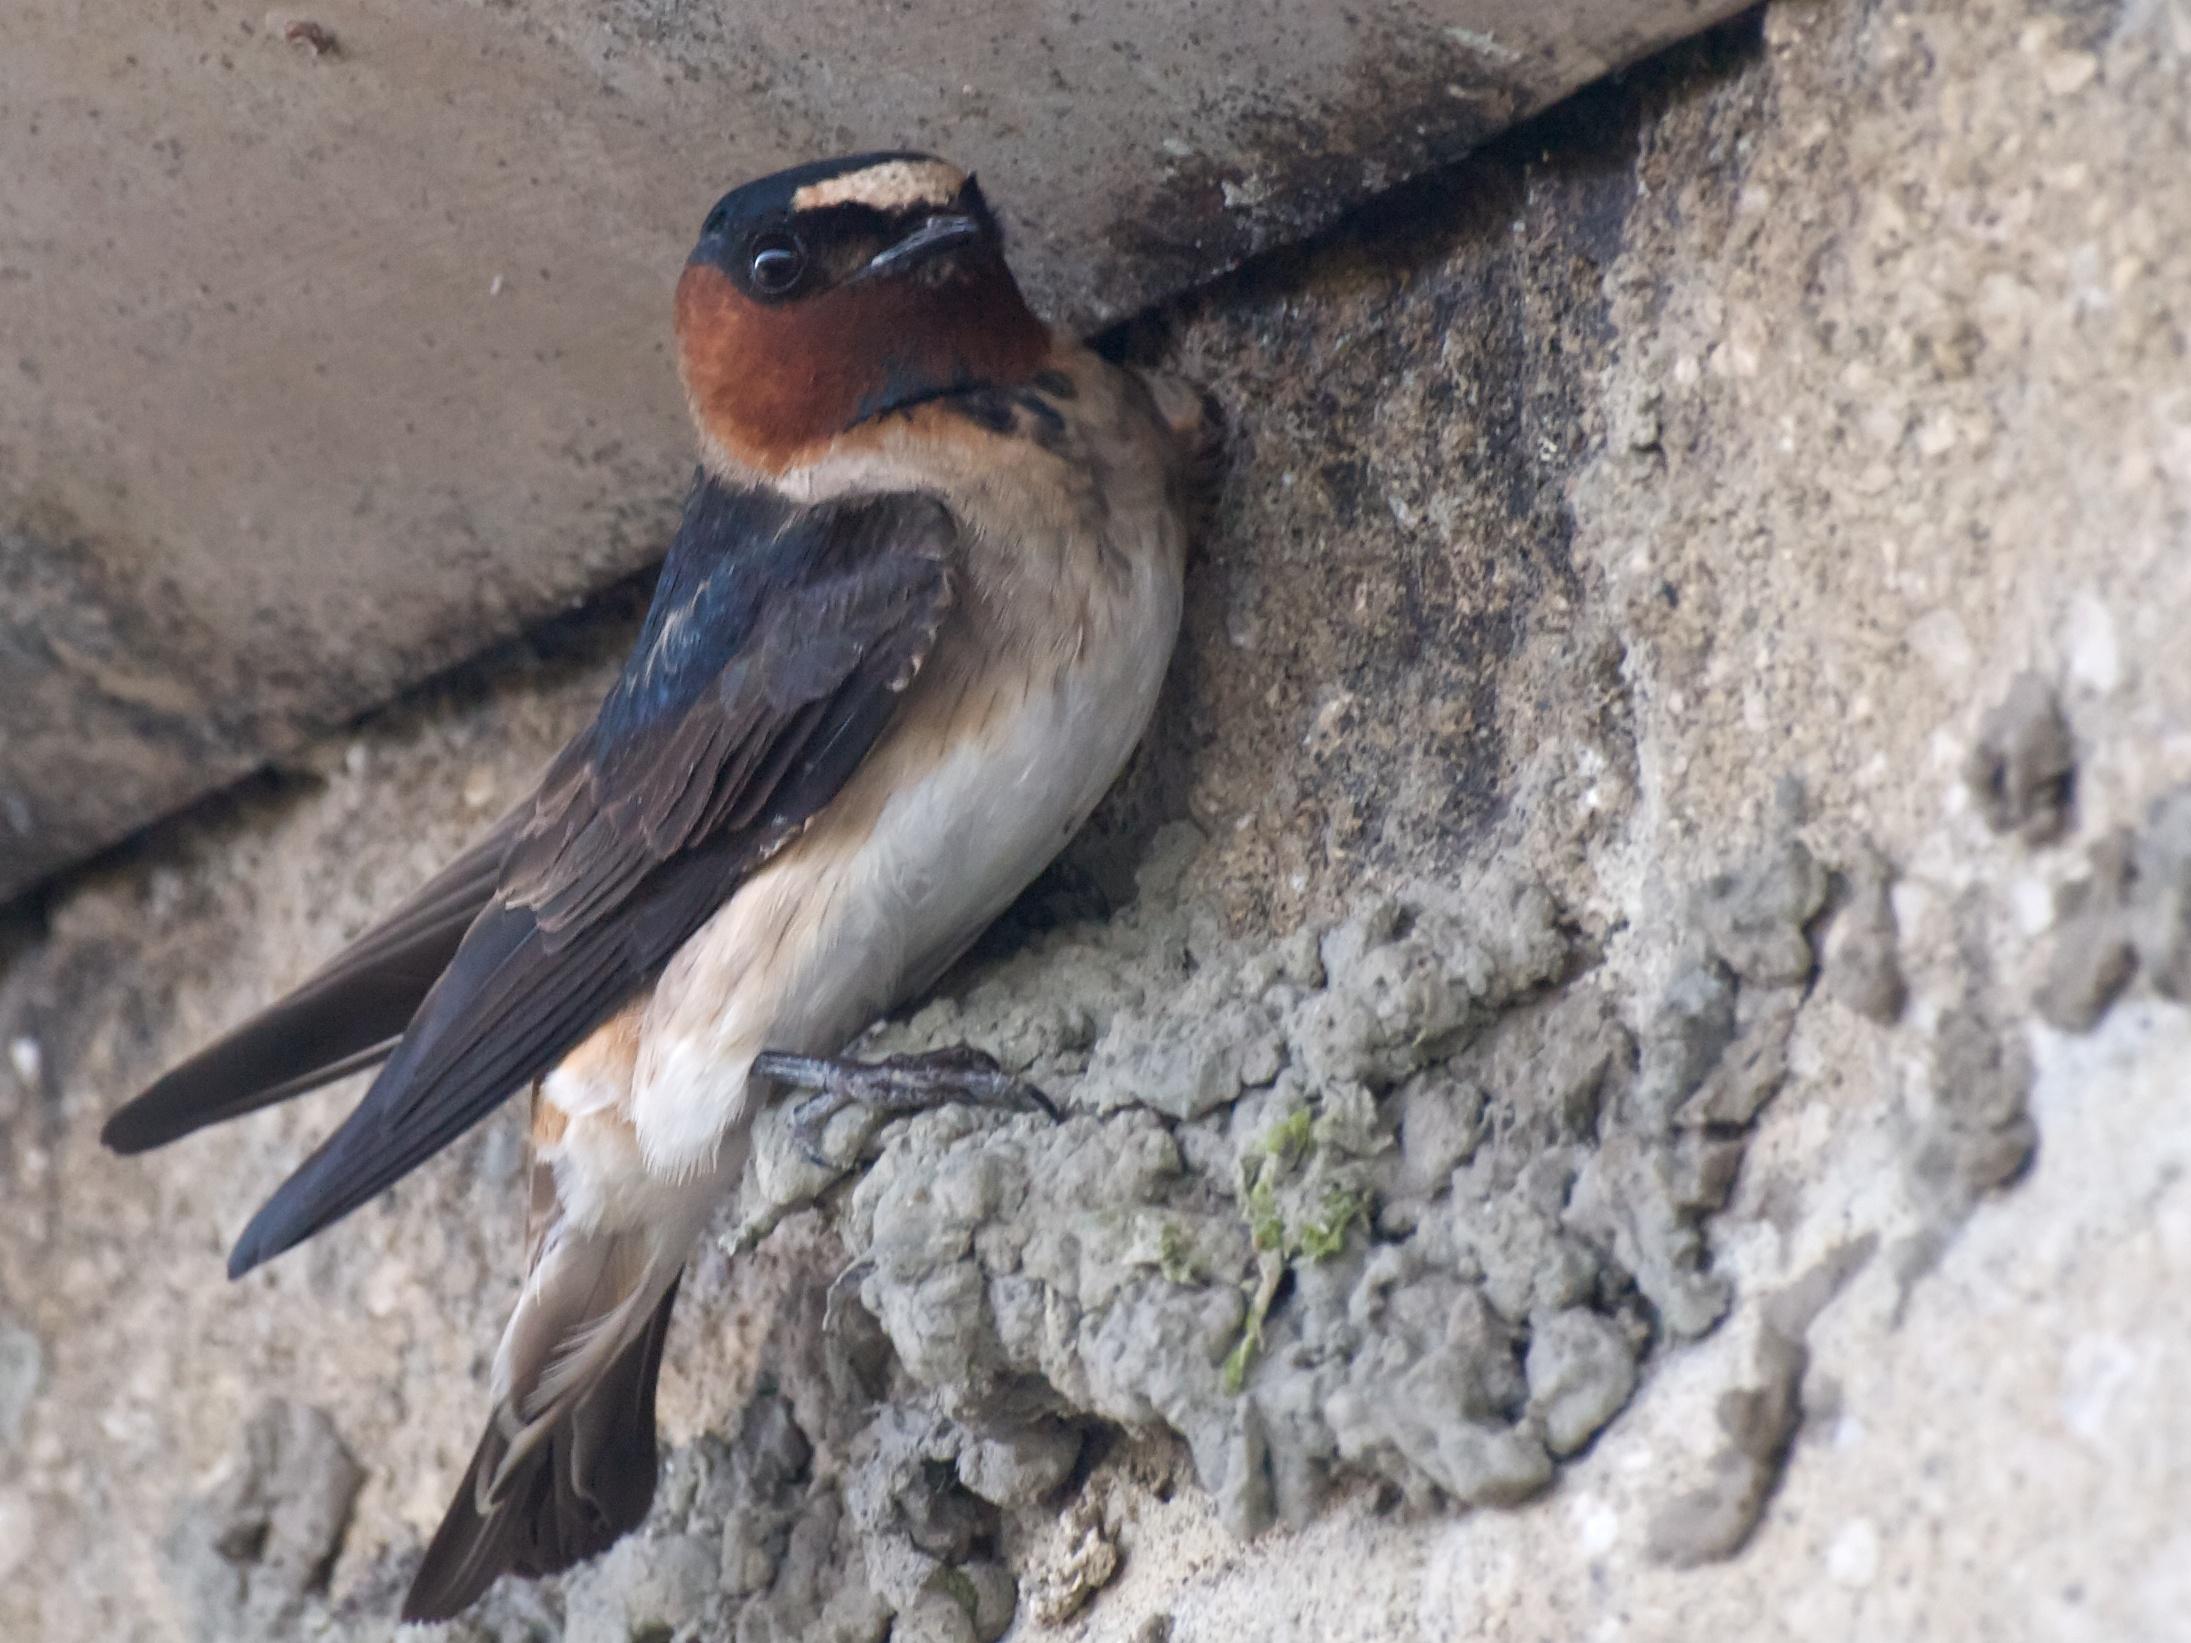 Swallow nesting in Capistrano